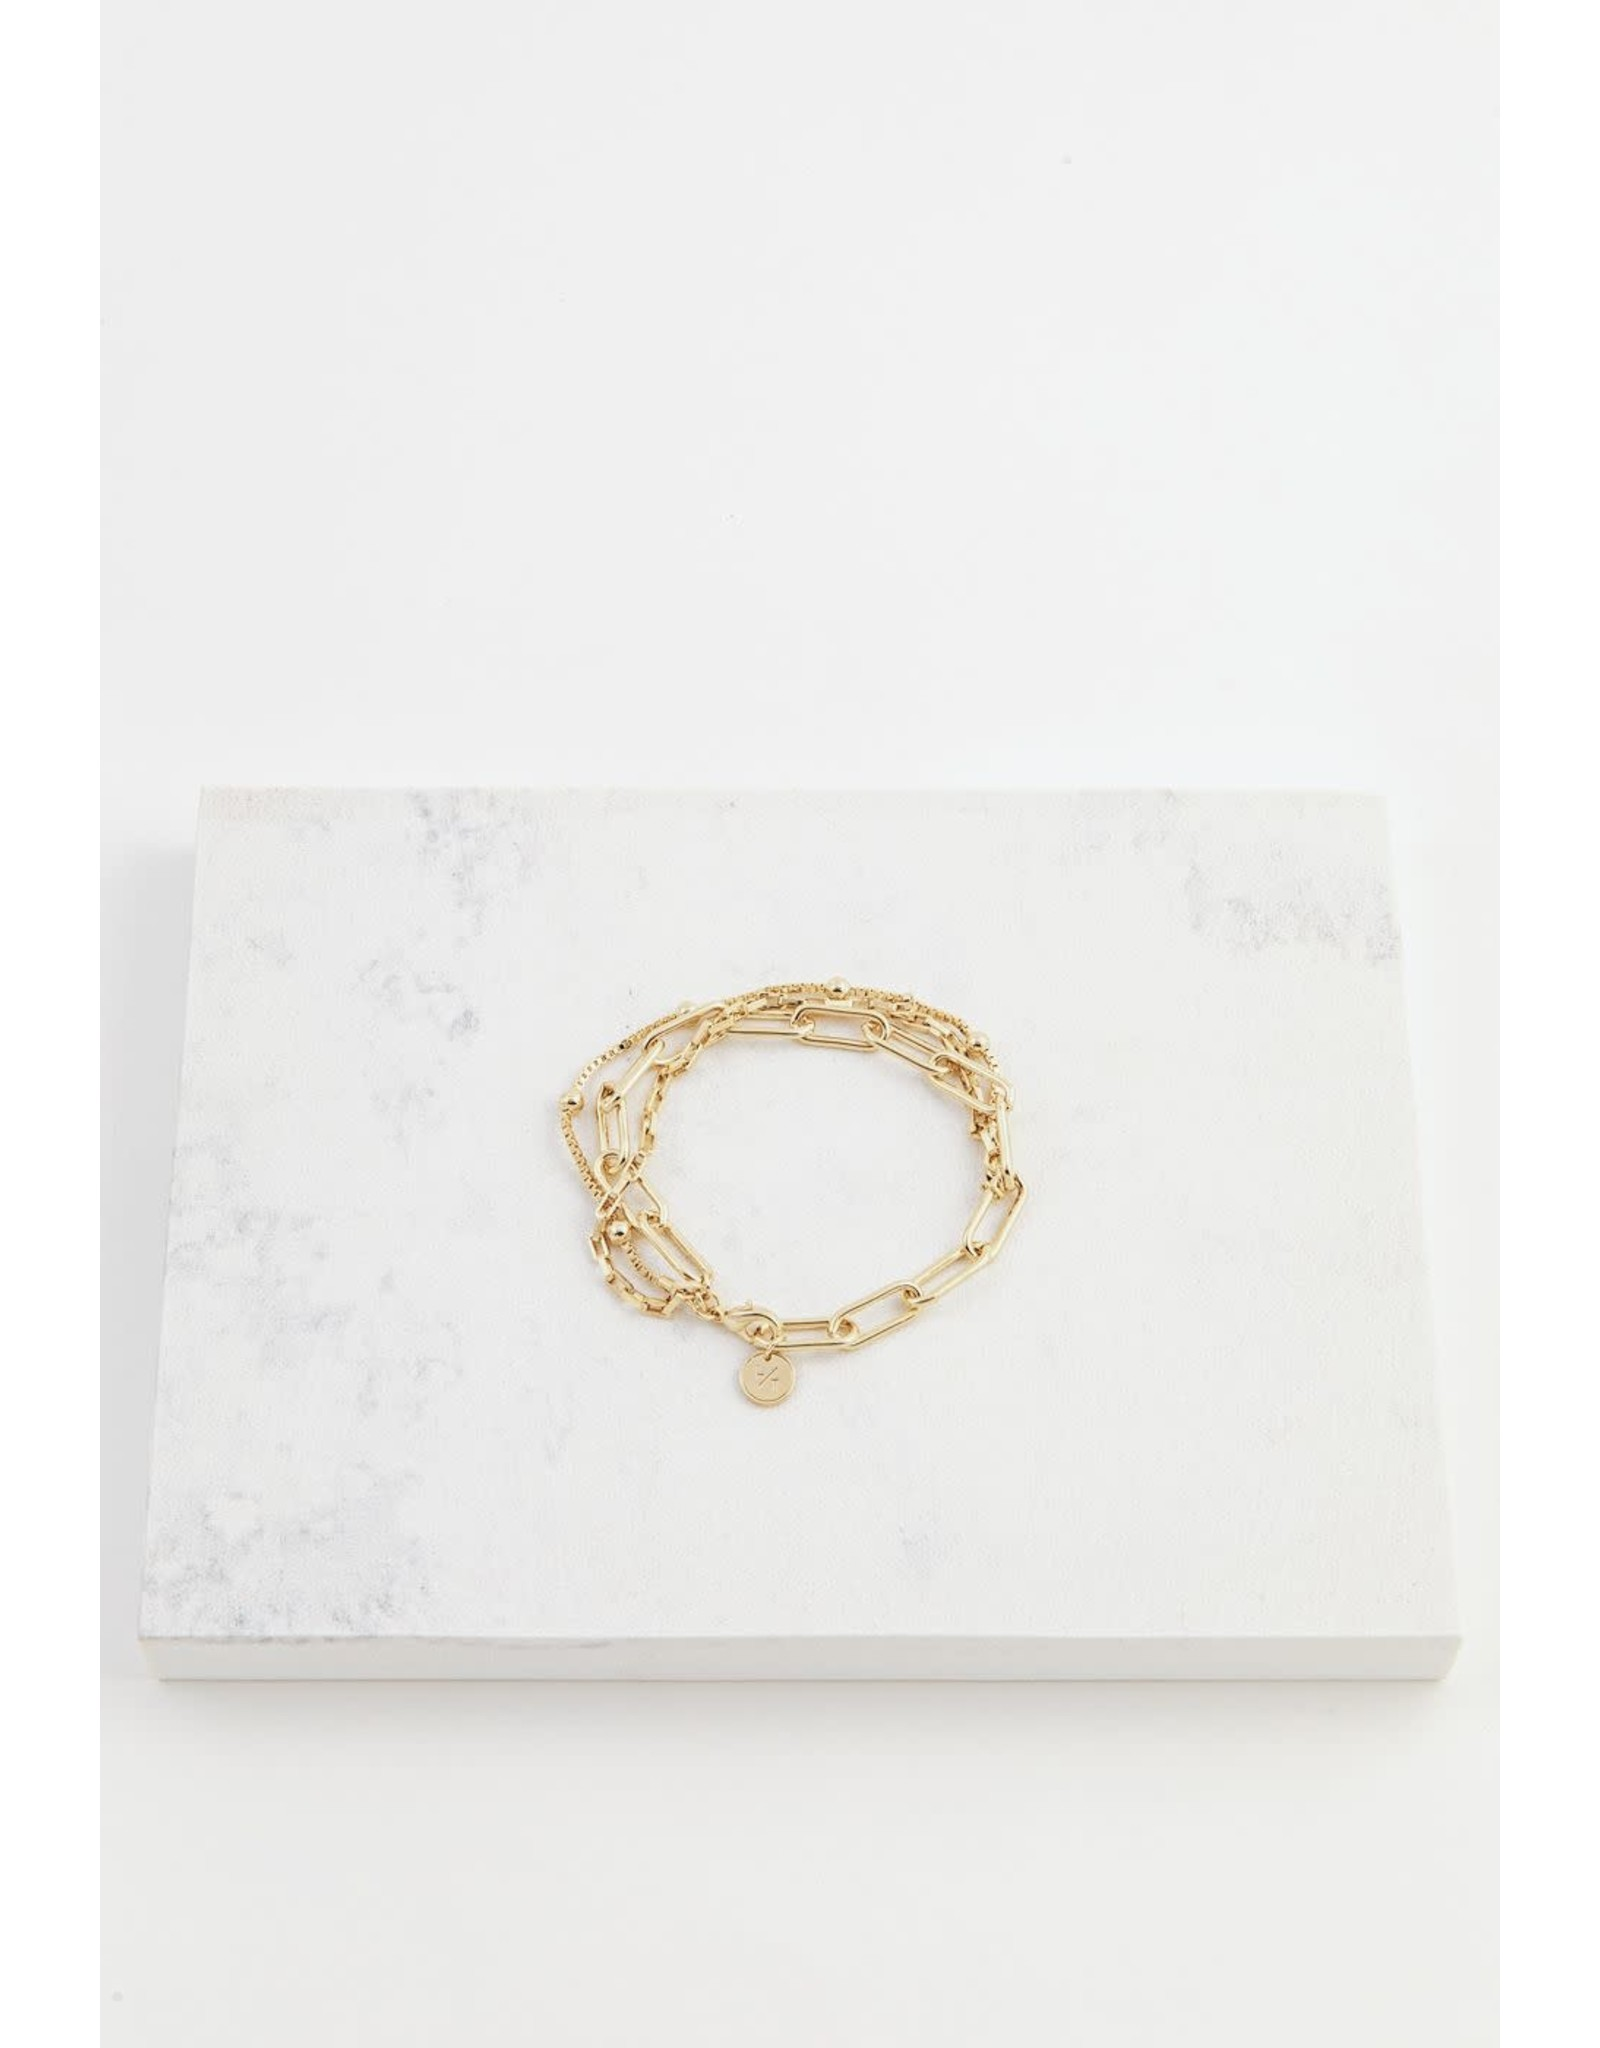 Lover's Tempo Shay Bracelet - Gold